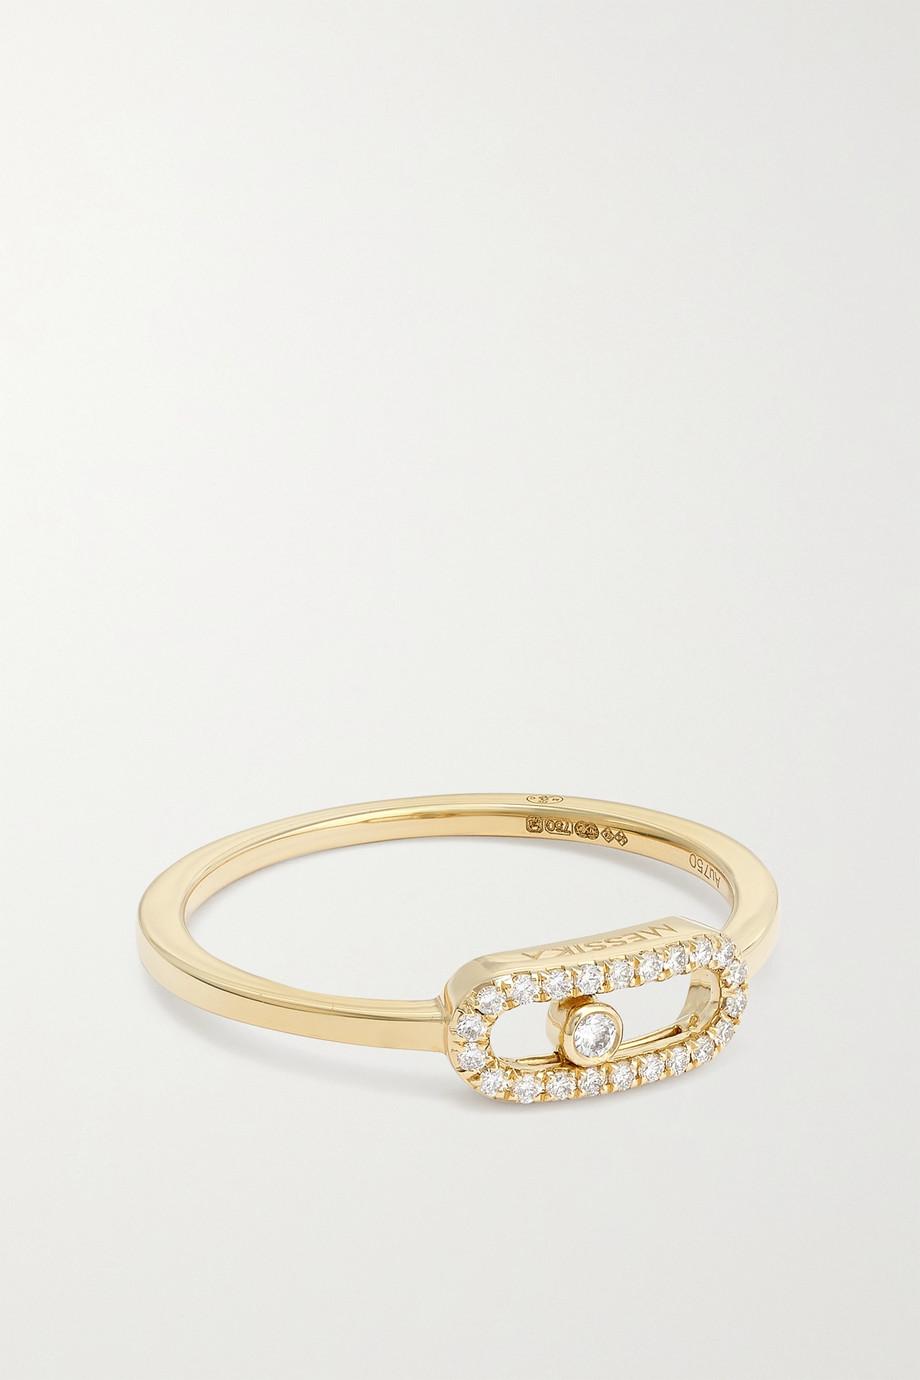 Messika Bague en or 18 carats (750/1000) et diamants Move Uno